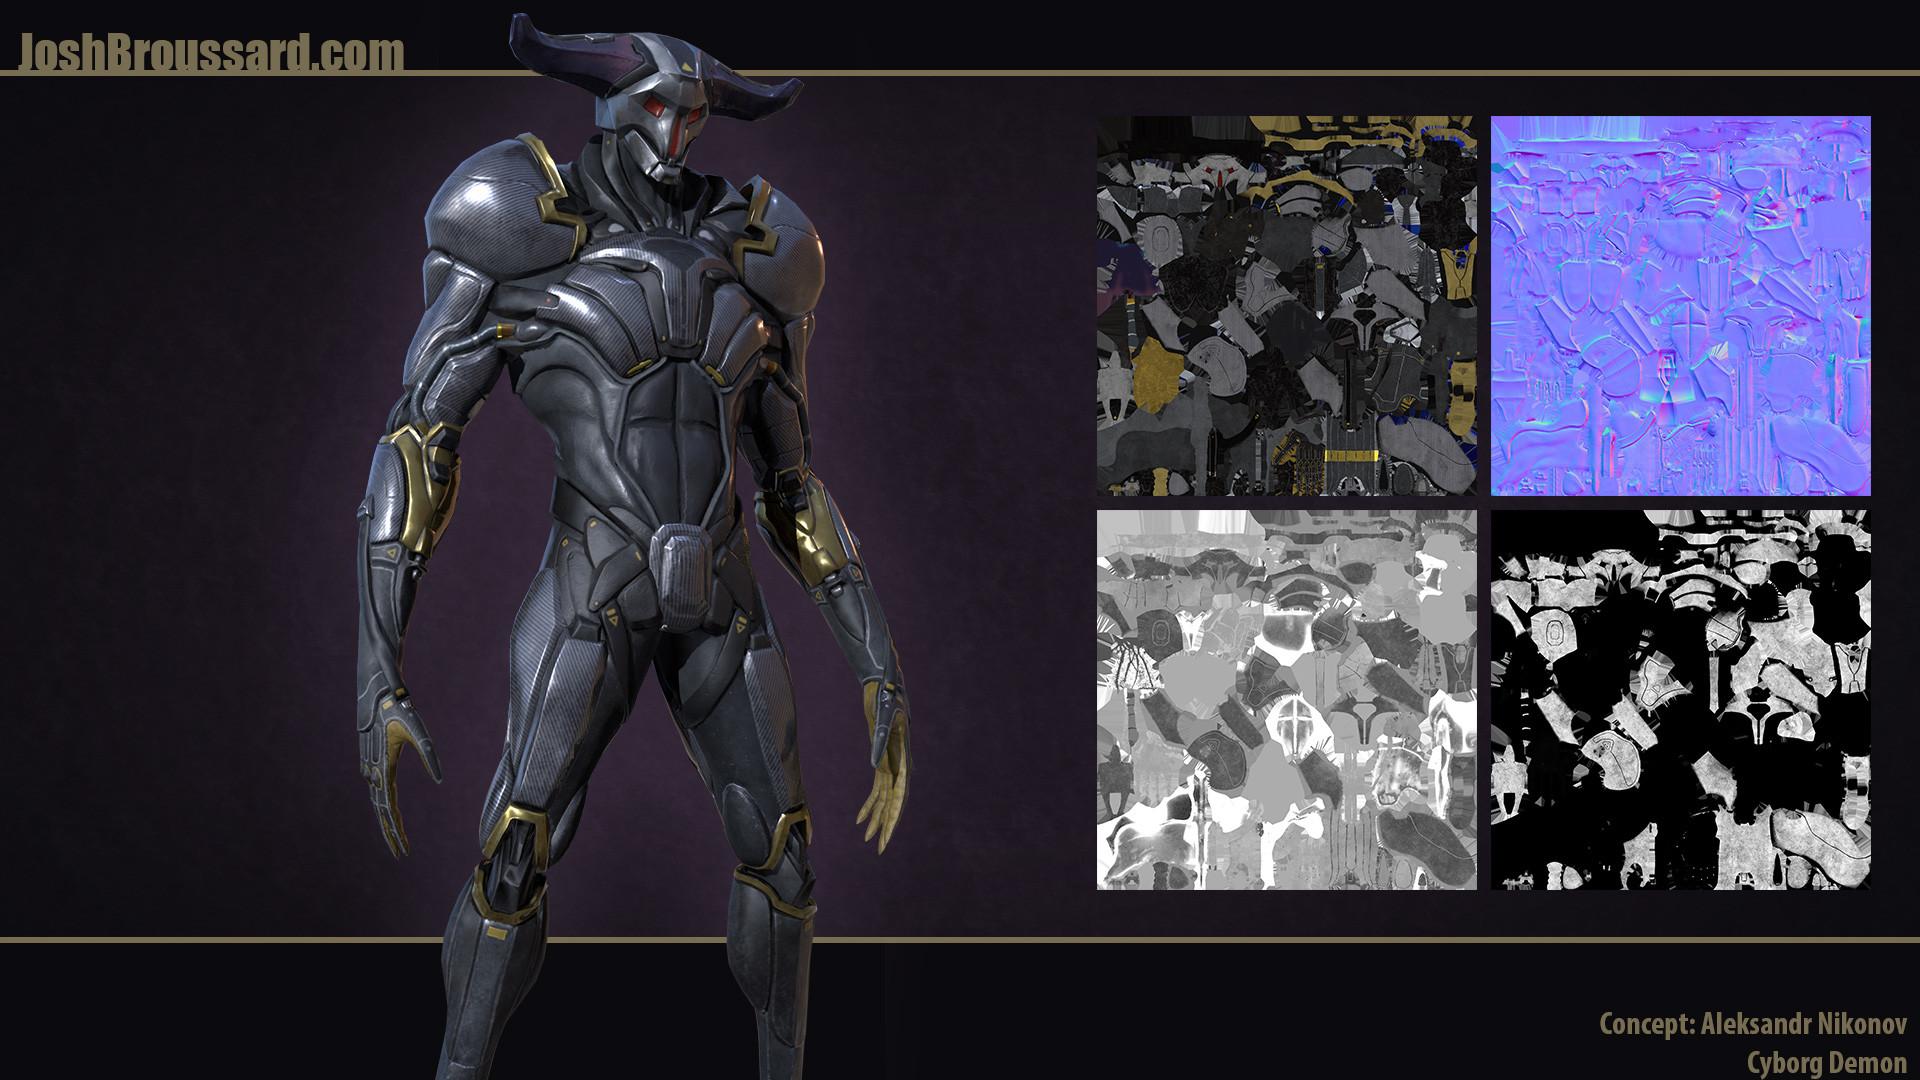 Joshua broussard chr cyborgdemon 04 material